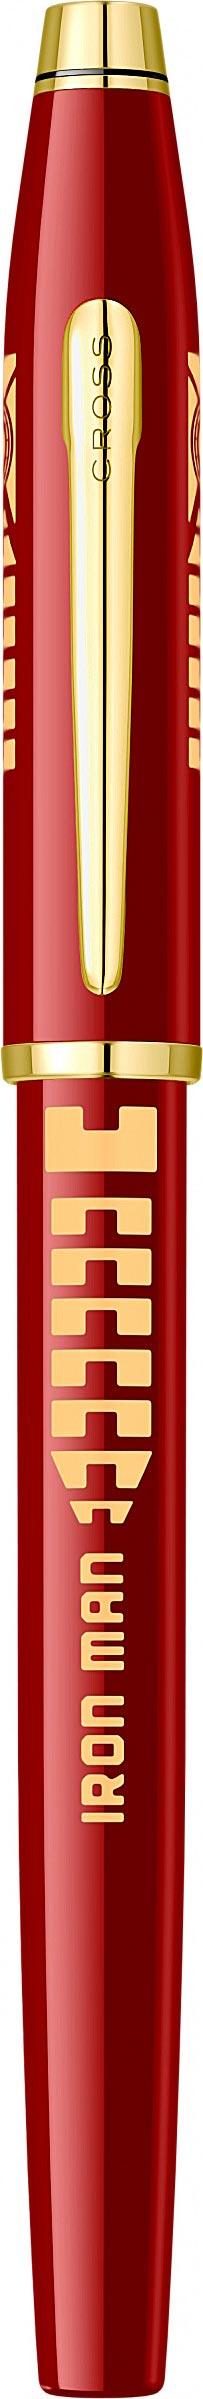 Century II Marvel Cross